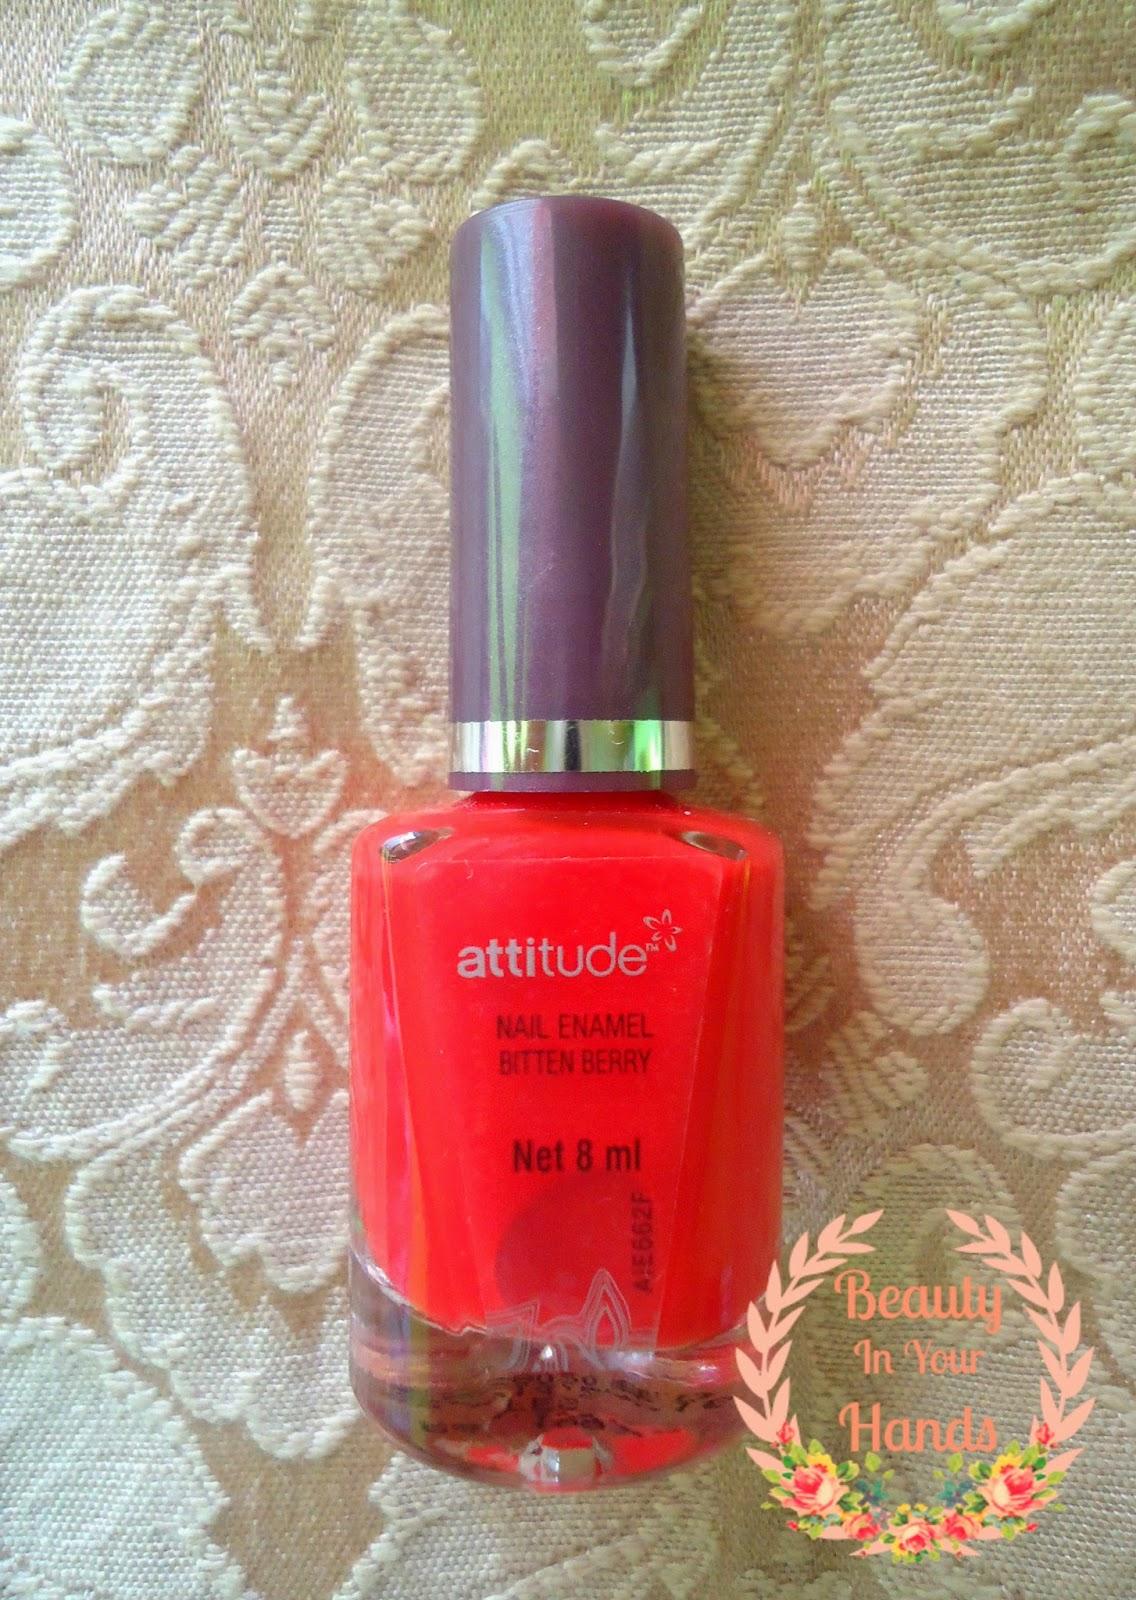 Beauty In Your Hands: Attitude Nail Enamel - Bitten Berry Review